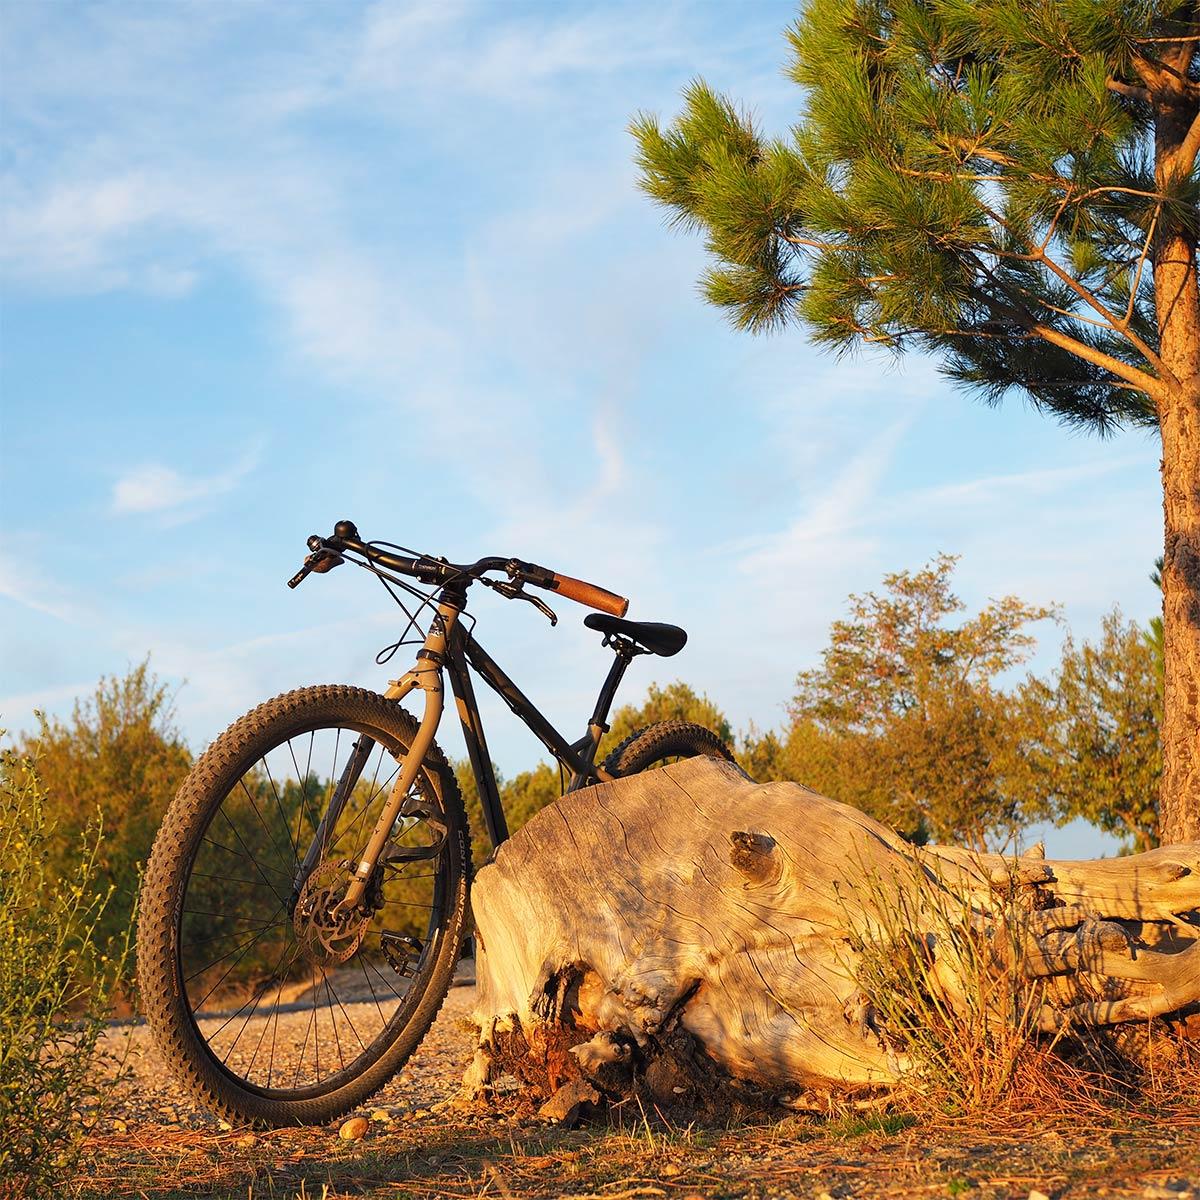 bicyclette-surly-parenthese-automne-yoniquenews-laboutiquedemelimelo